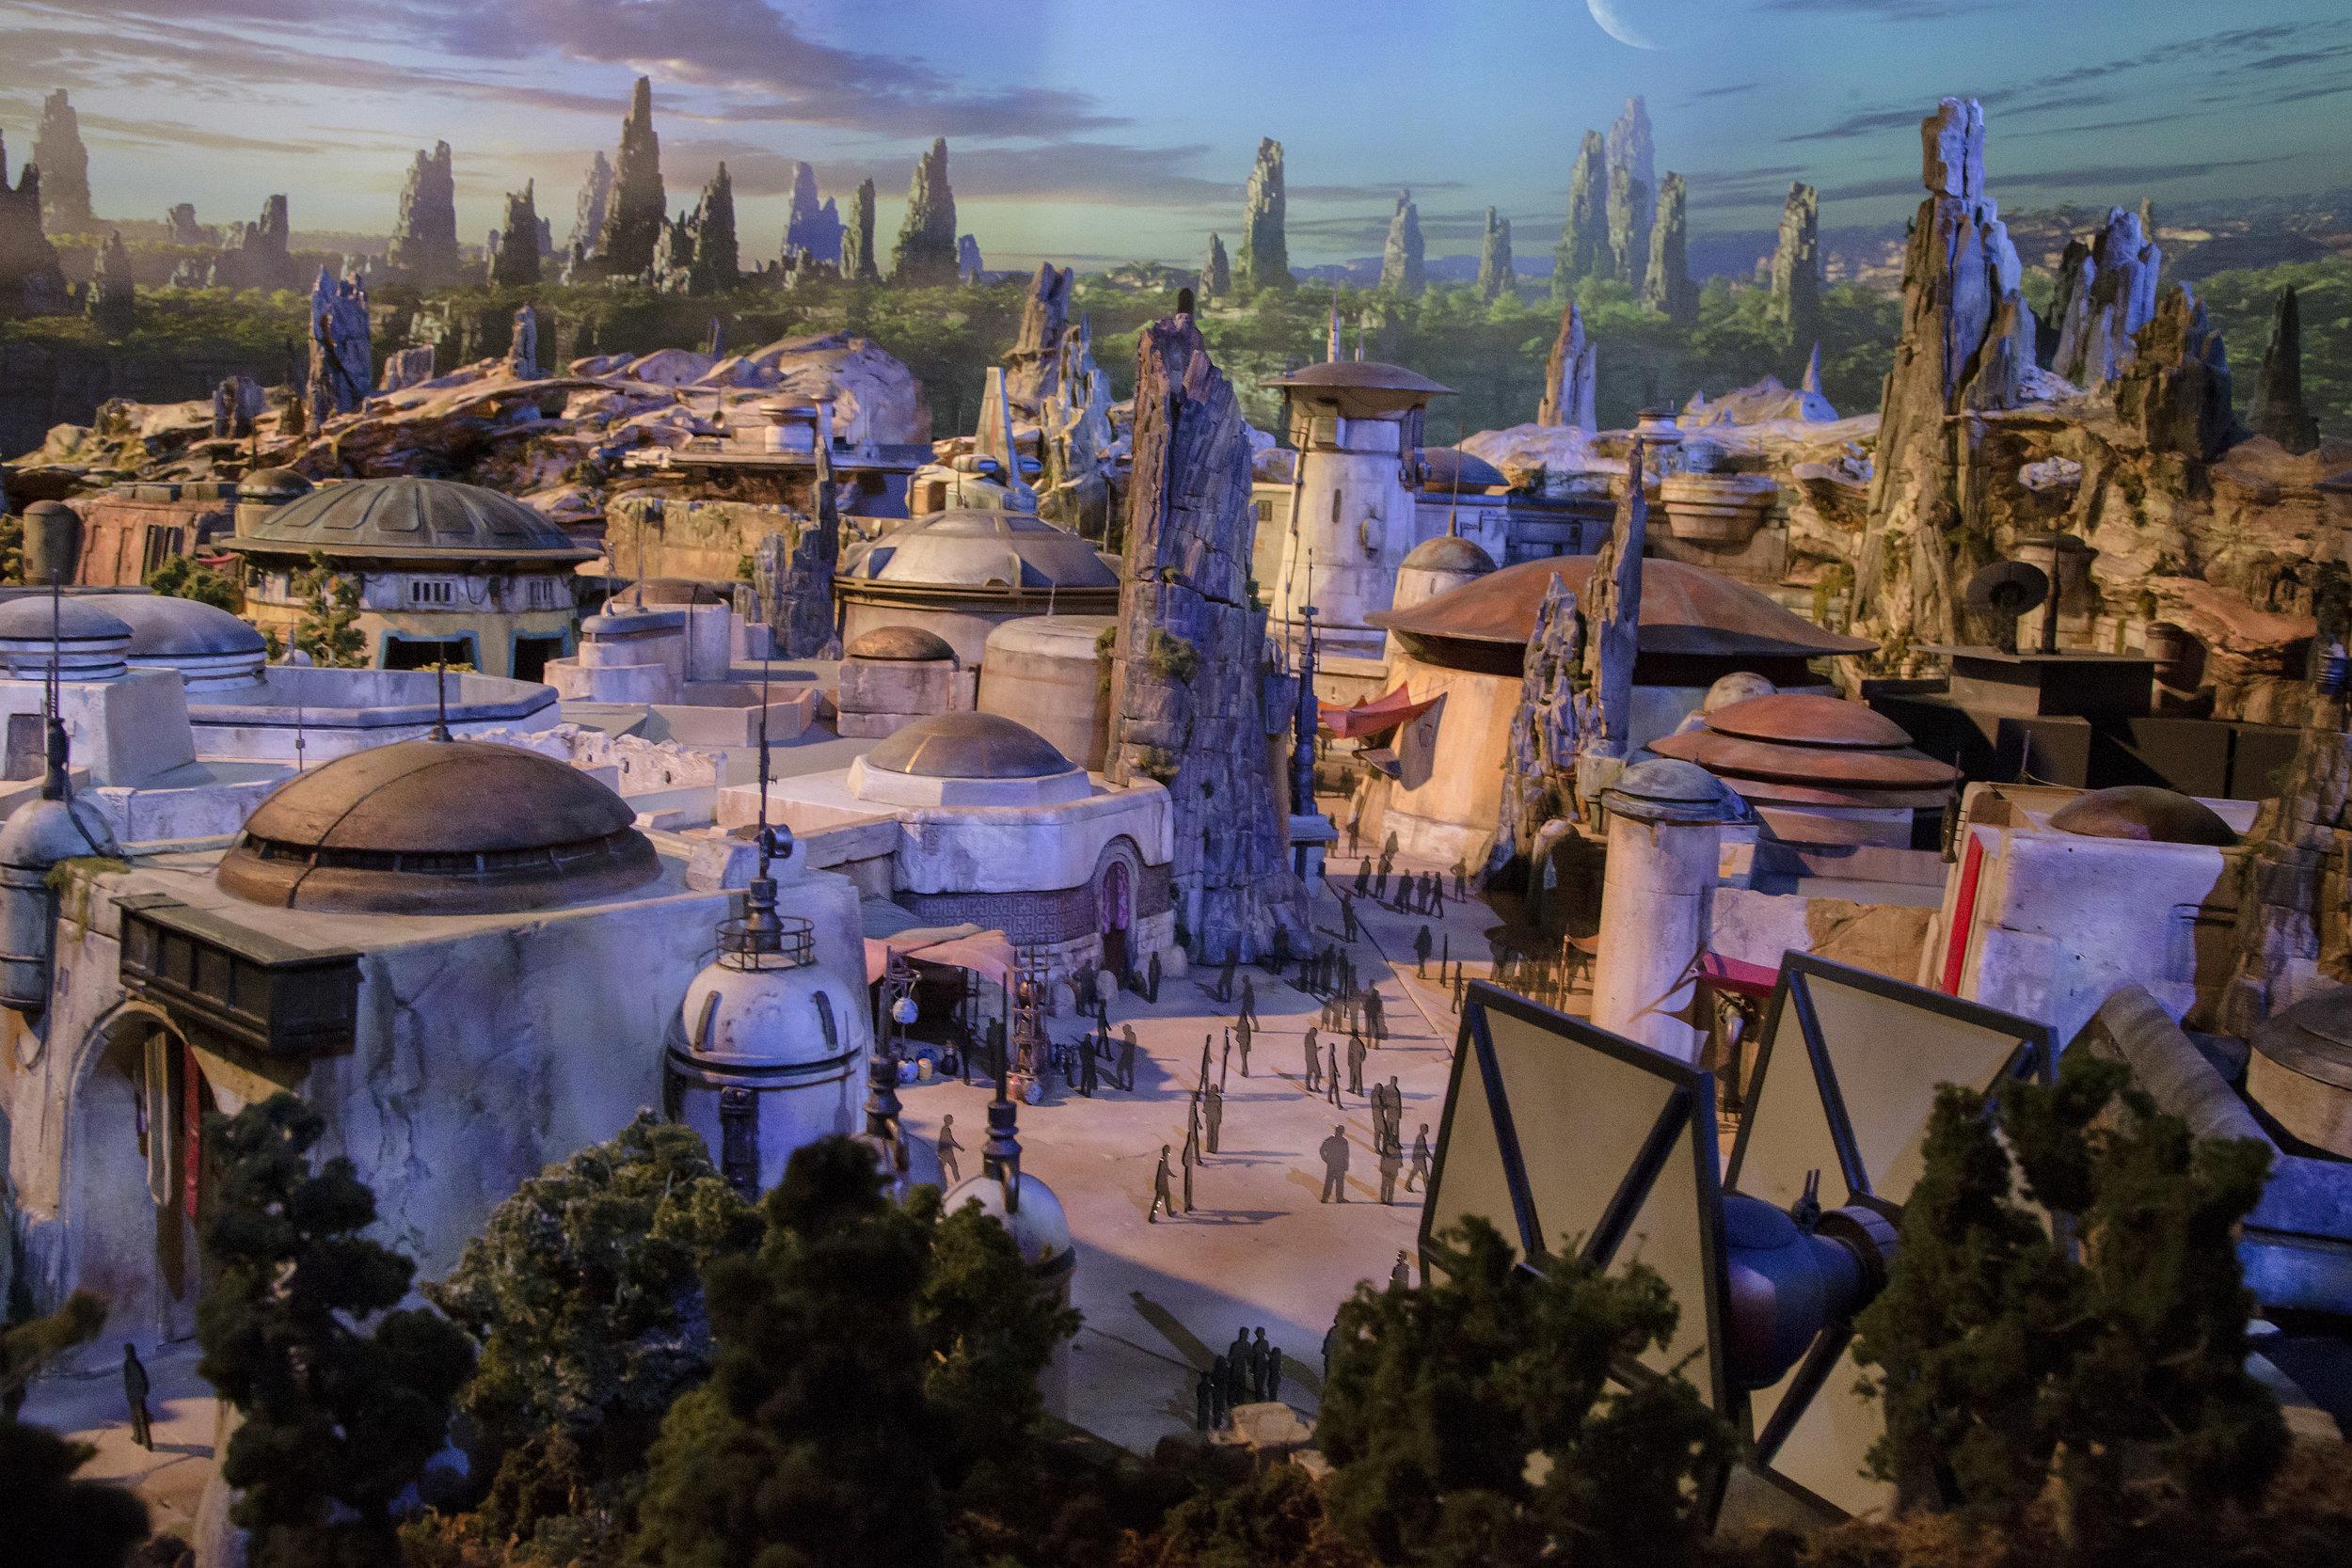 Rendering of Star Wars: Galaxy's Edge